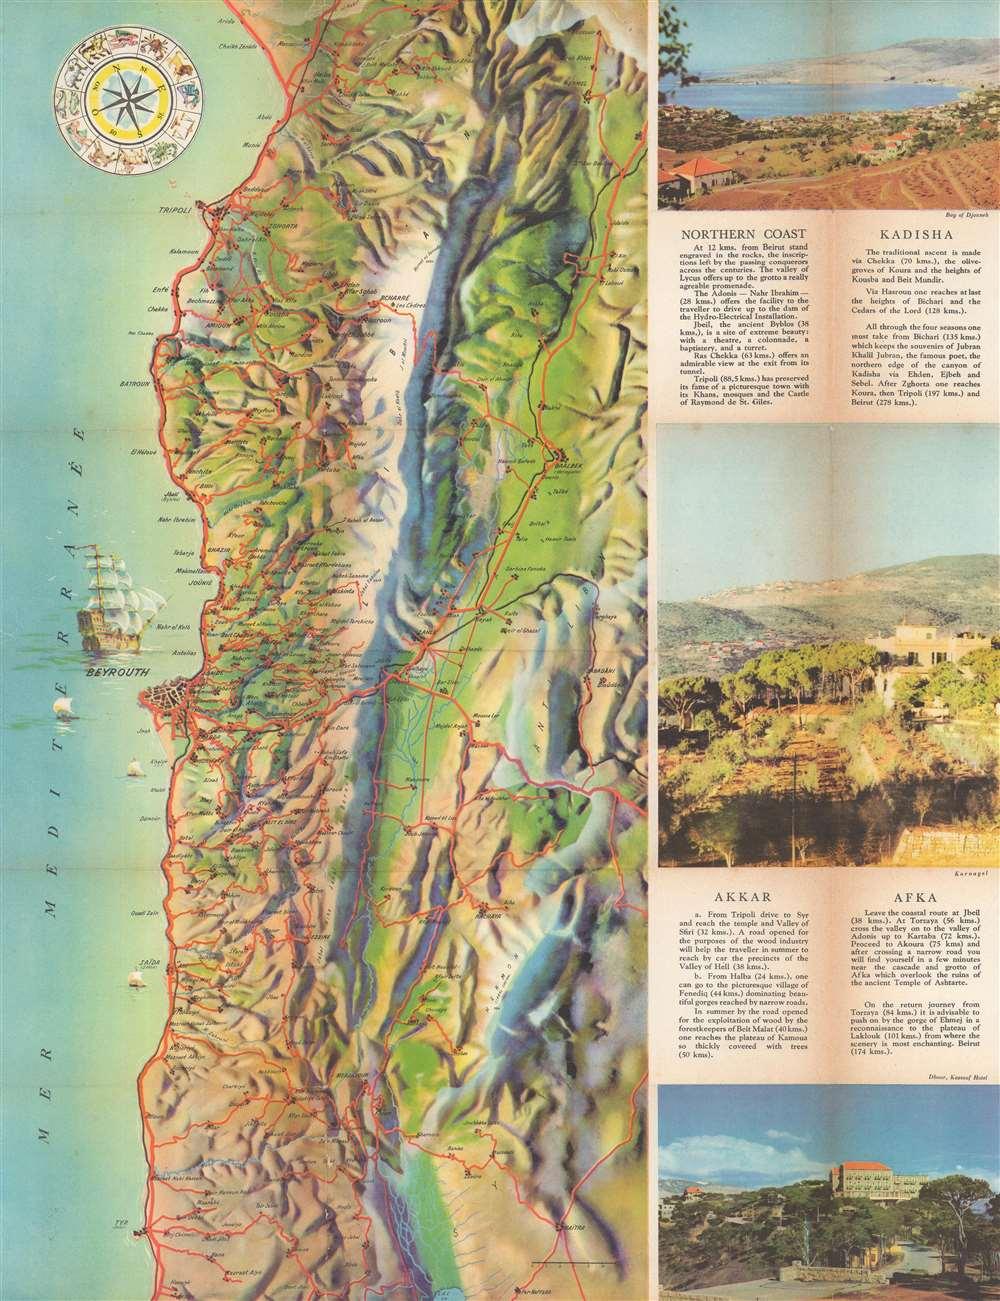 1950 Pictorial Tourist Map of Lebanon